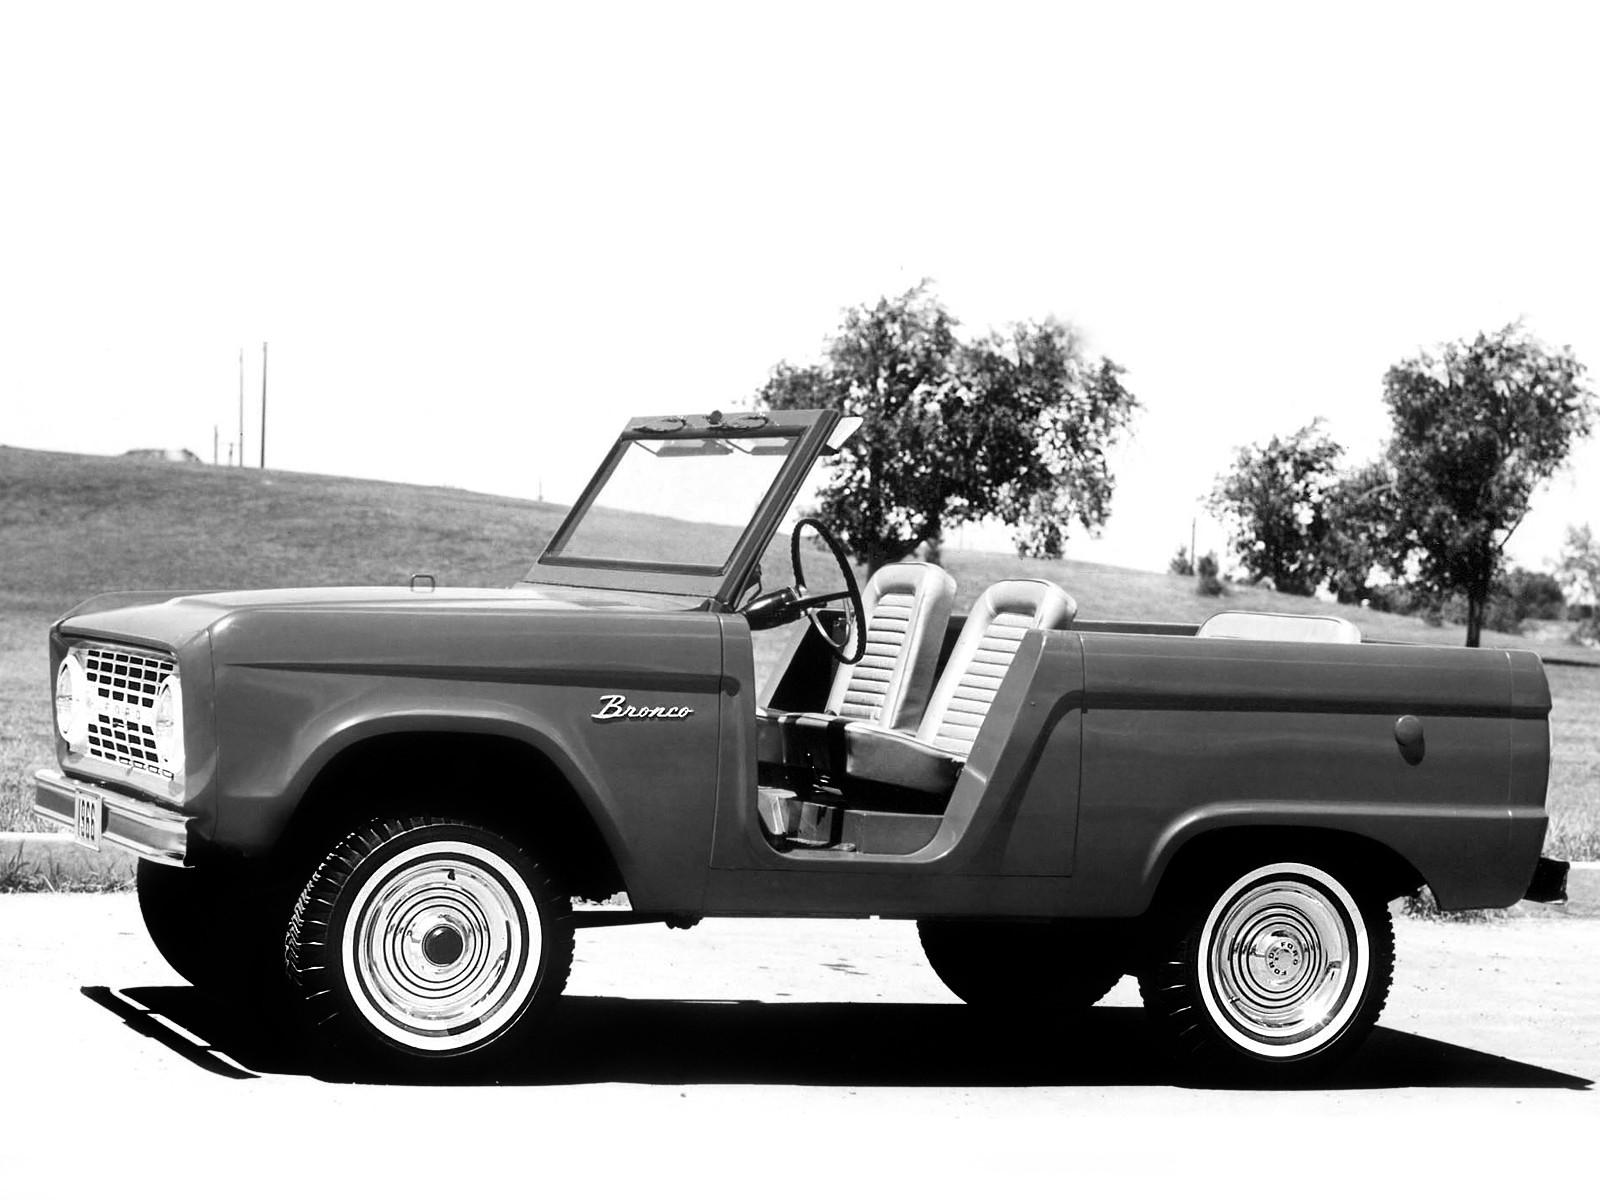 FORD Bronco specs & photos - 1966, 1967, 1968, 1969, 1970, 1971, 1972, 1973, 1974, 1975, 1976 ...